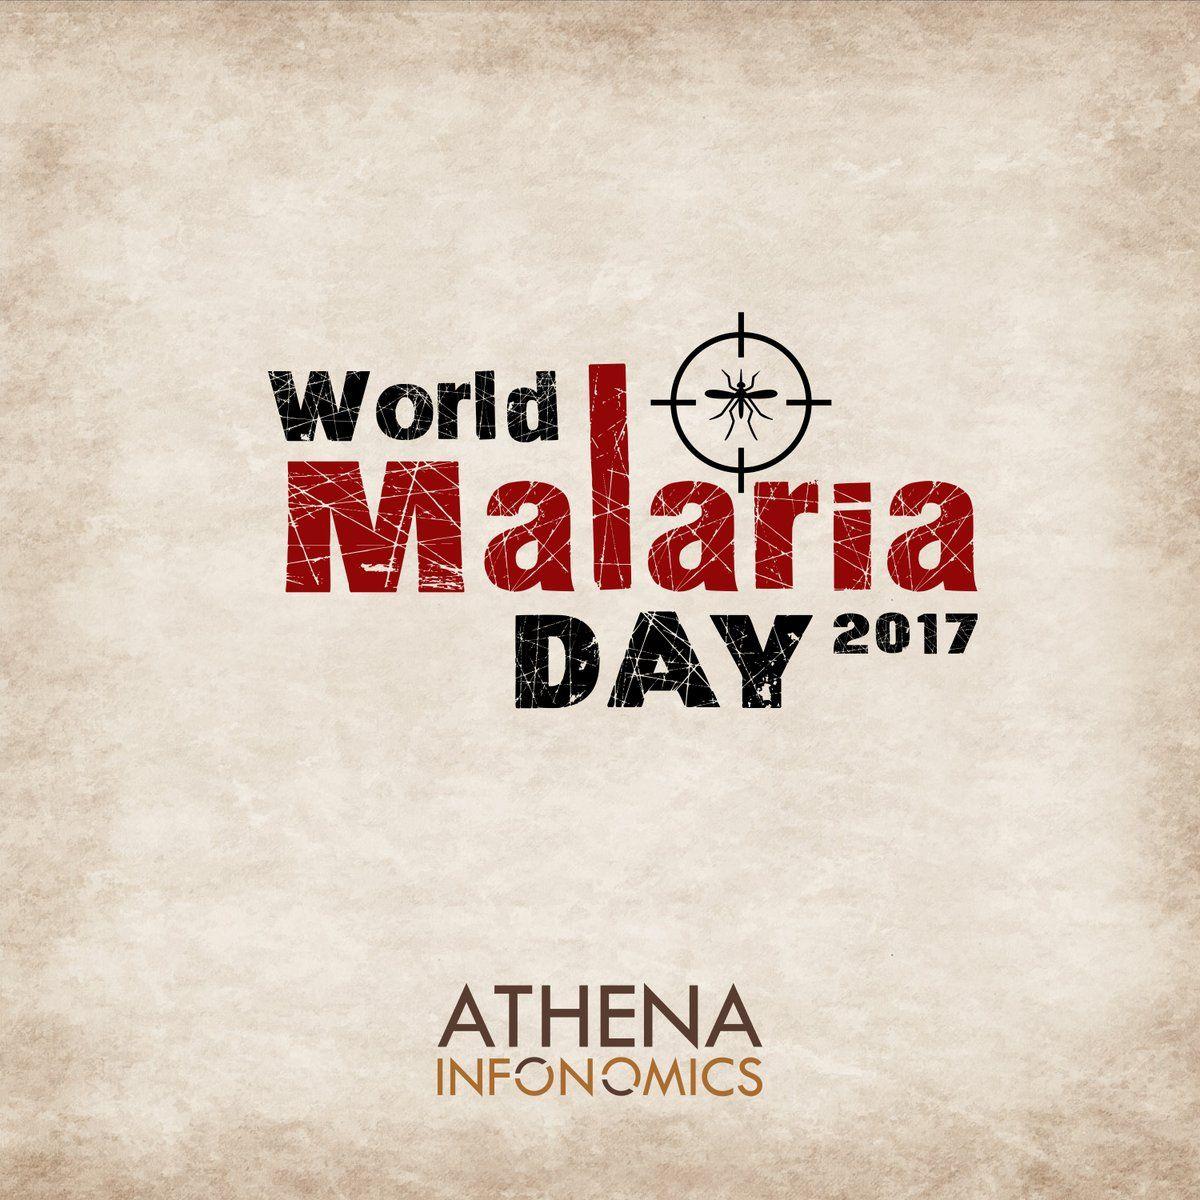 Poster design tools -  Rajagoldwinsilva Poster Design Mnemonic Logo Malariaday 2017 Malaria Poster Designstoolshealth